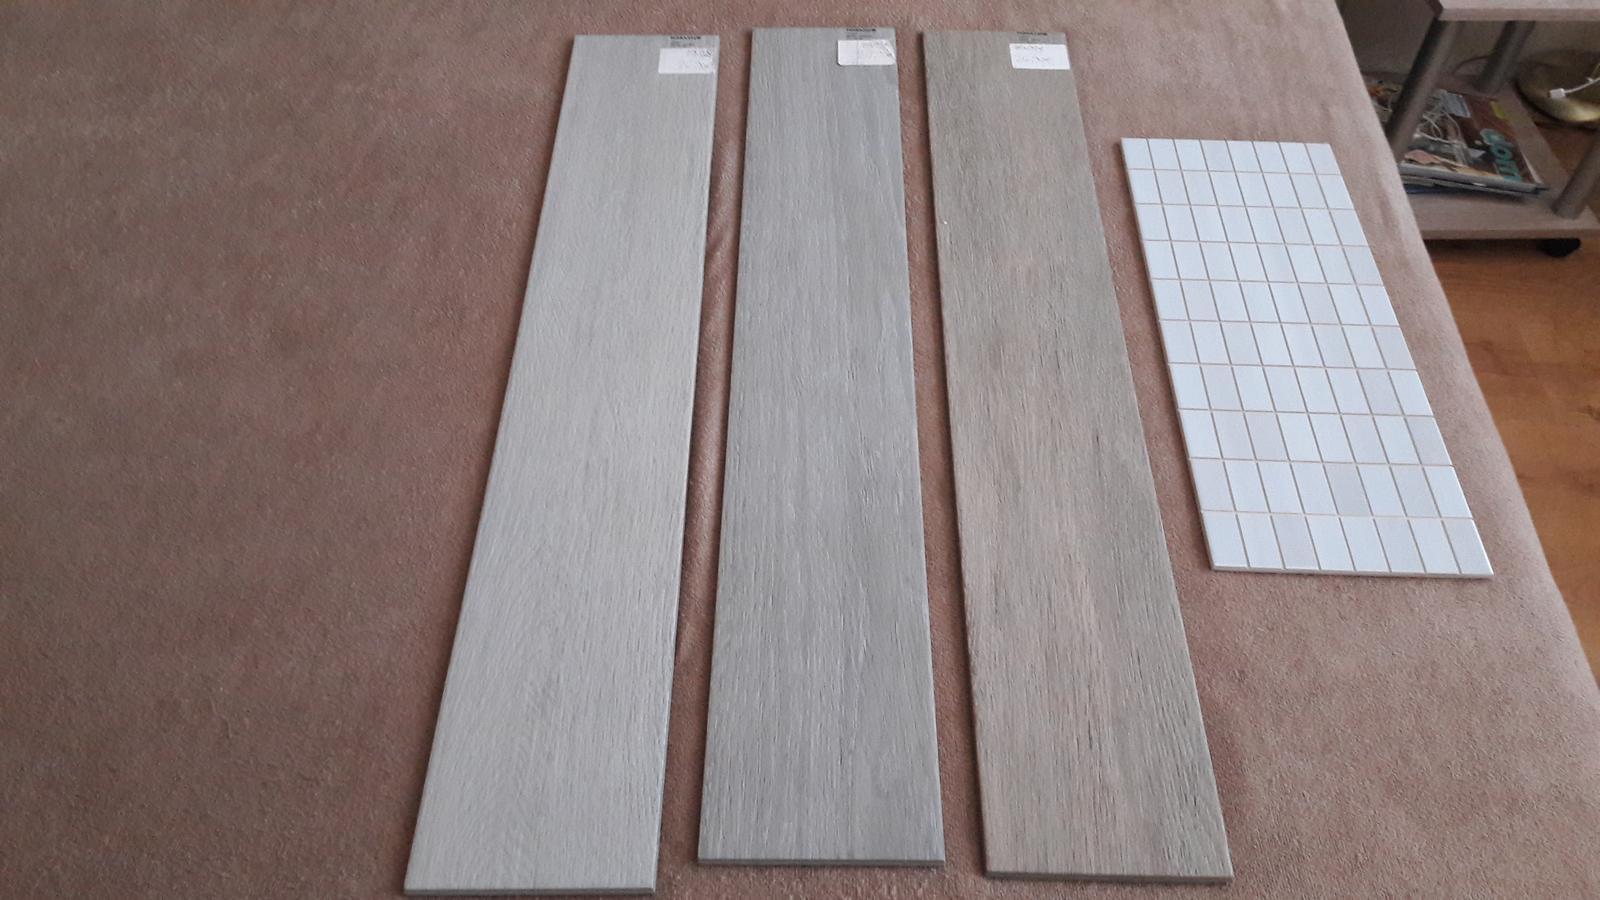 Domček -  individuálny projekt - vyberáme dlažbu do domu - MARAZZI PLANET a mozaiku do kúpelne